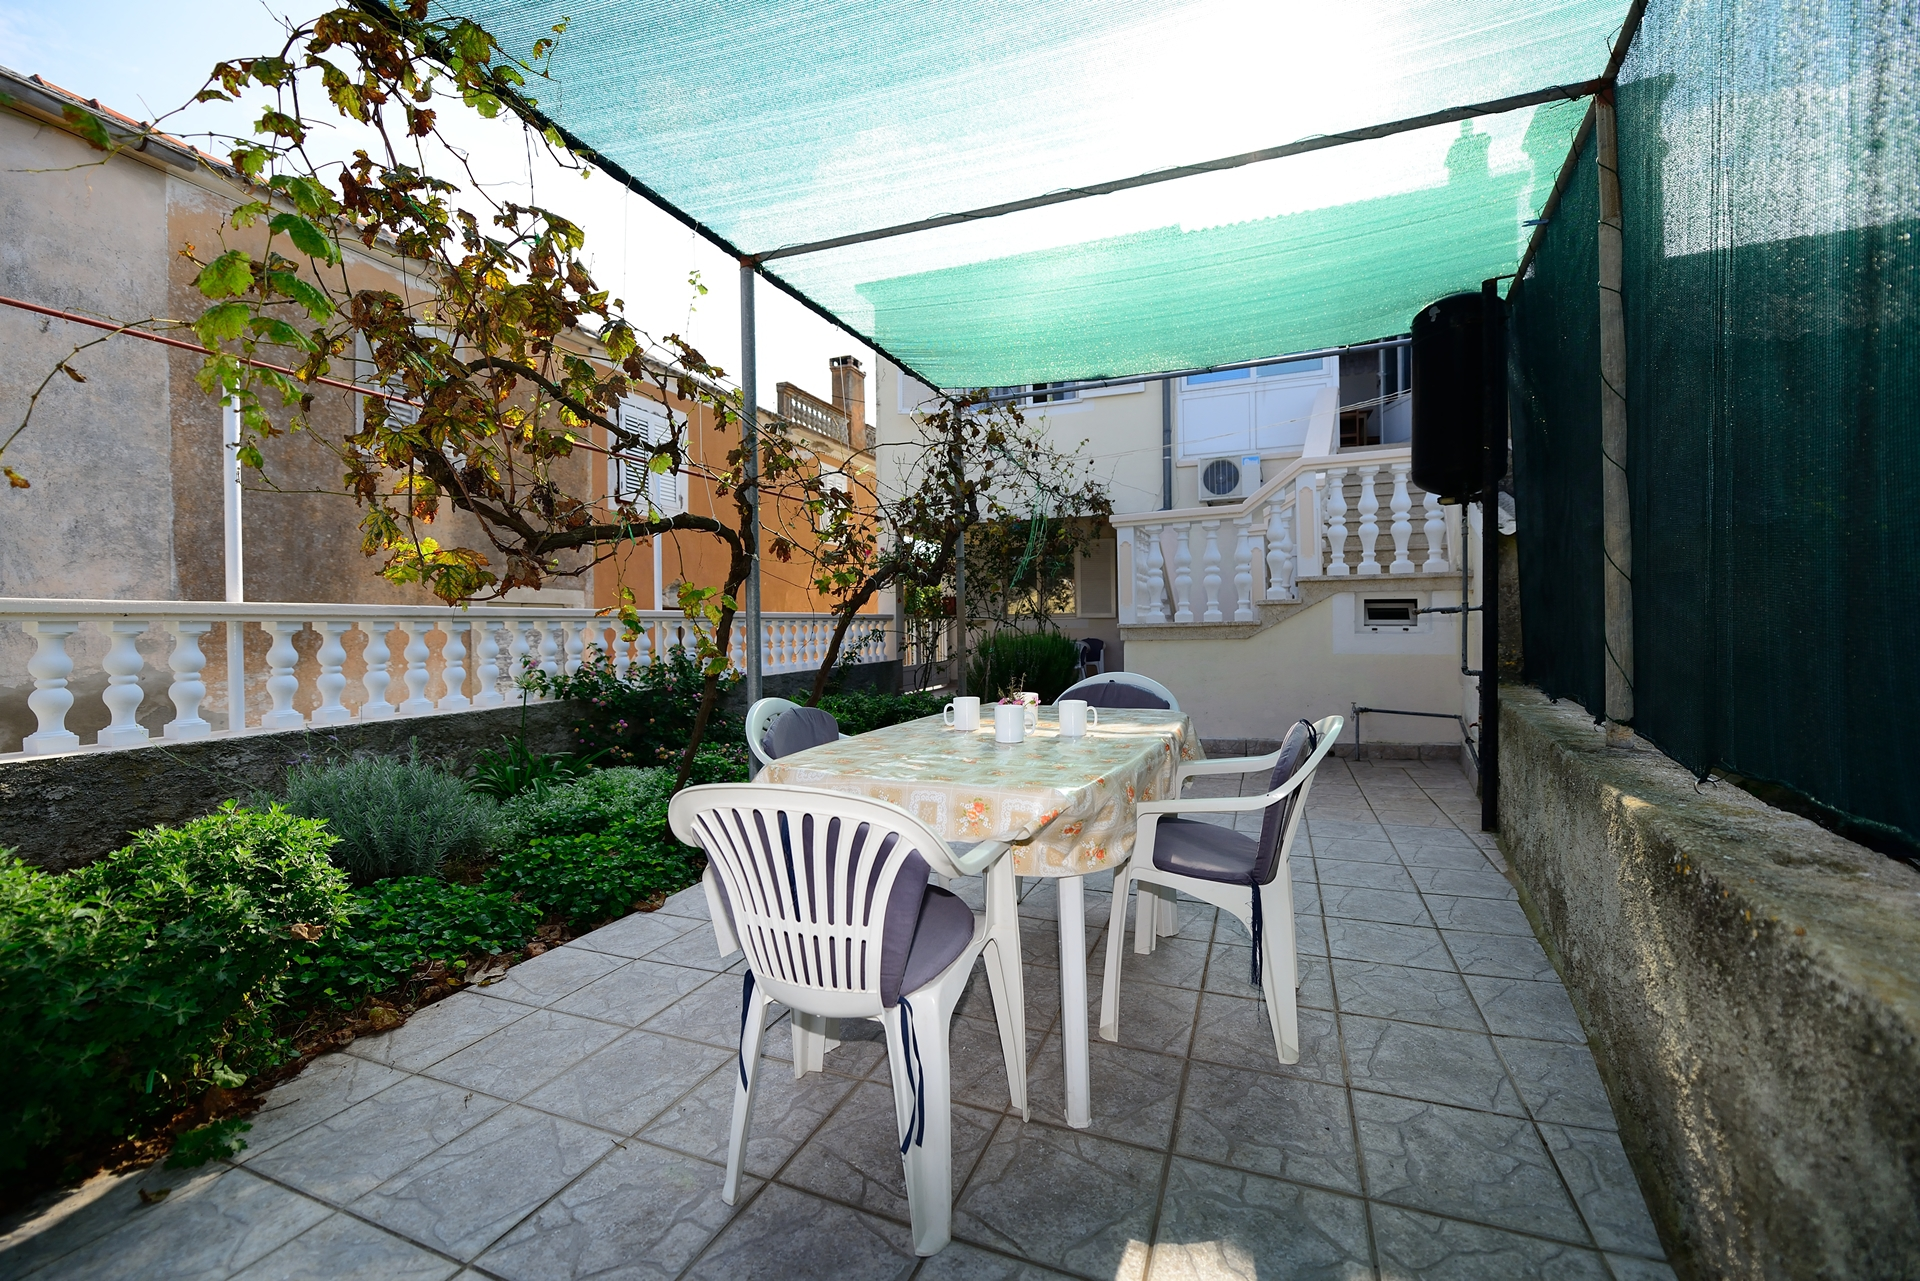 Martin - Lukoran - Vakantiehuizen, villa´s Kroatië - H(8): terras